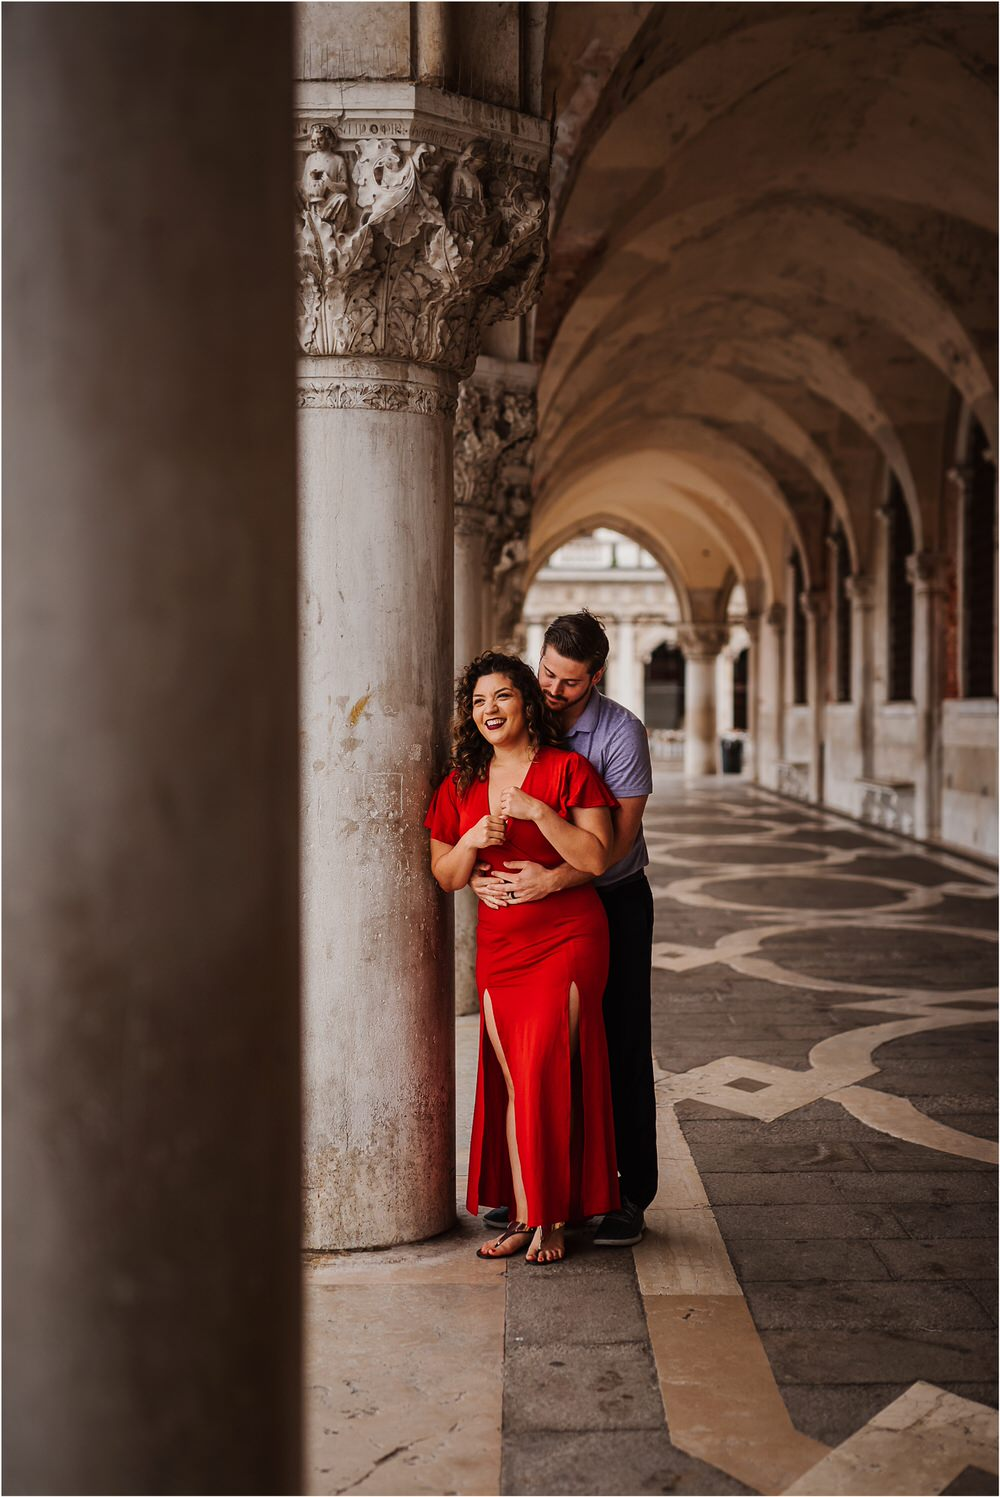 tuscany wedding photographer greece croatia dubrovnik vjencanje hochzeit wedding photography photos romantic engagement nika grega 0088.jpg